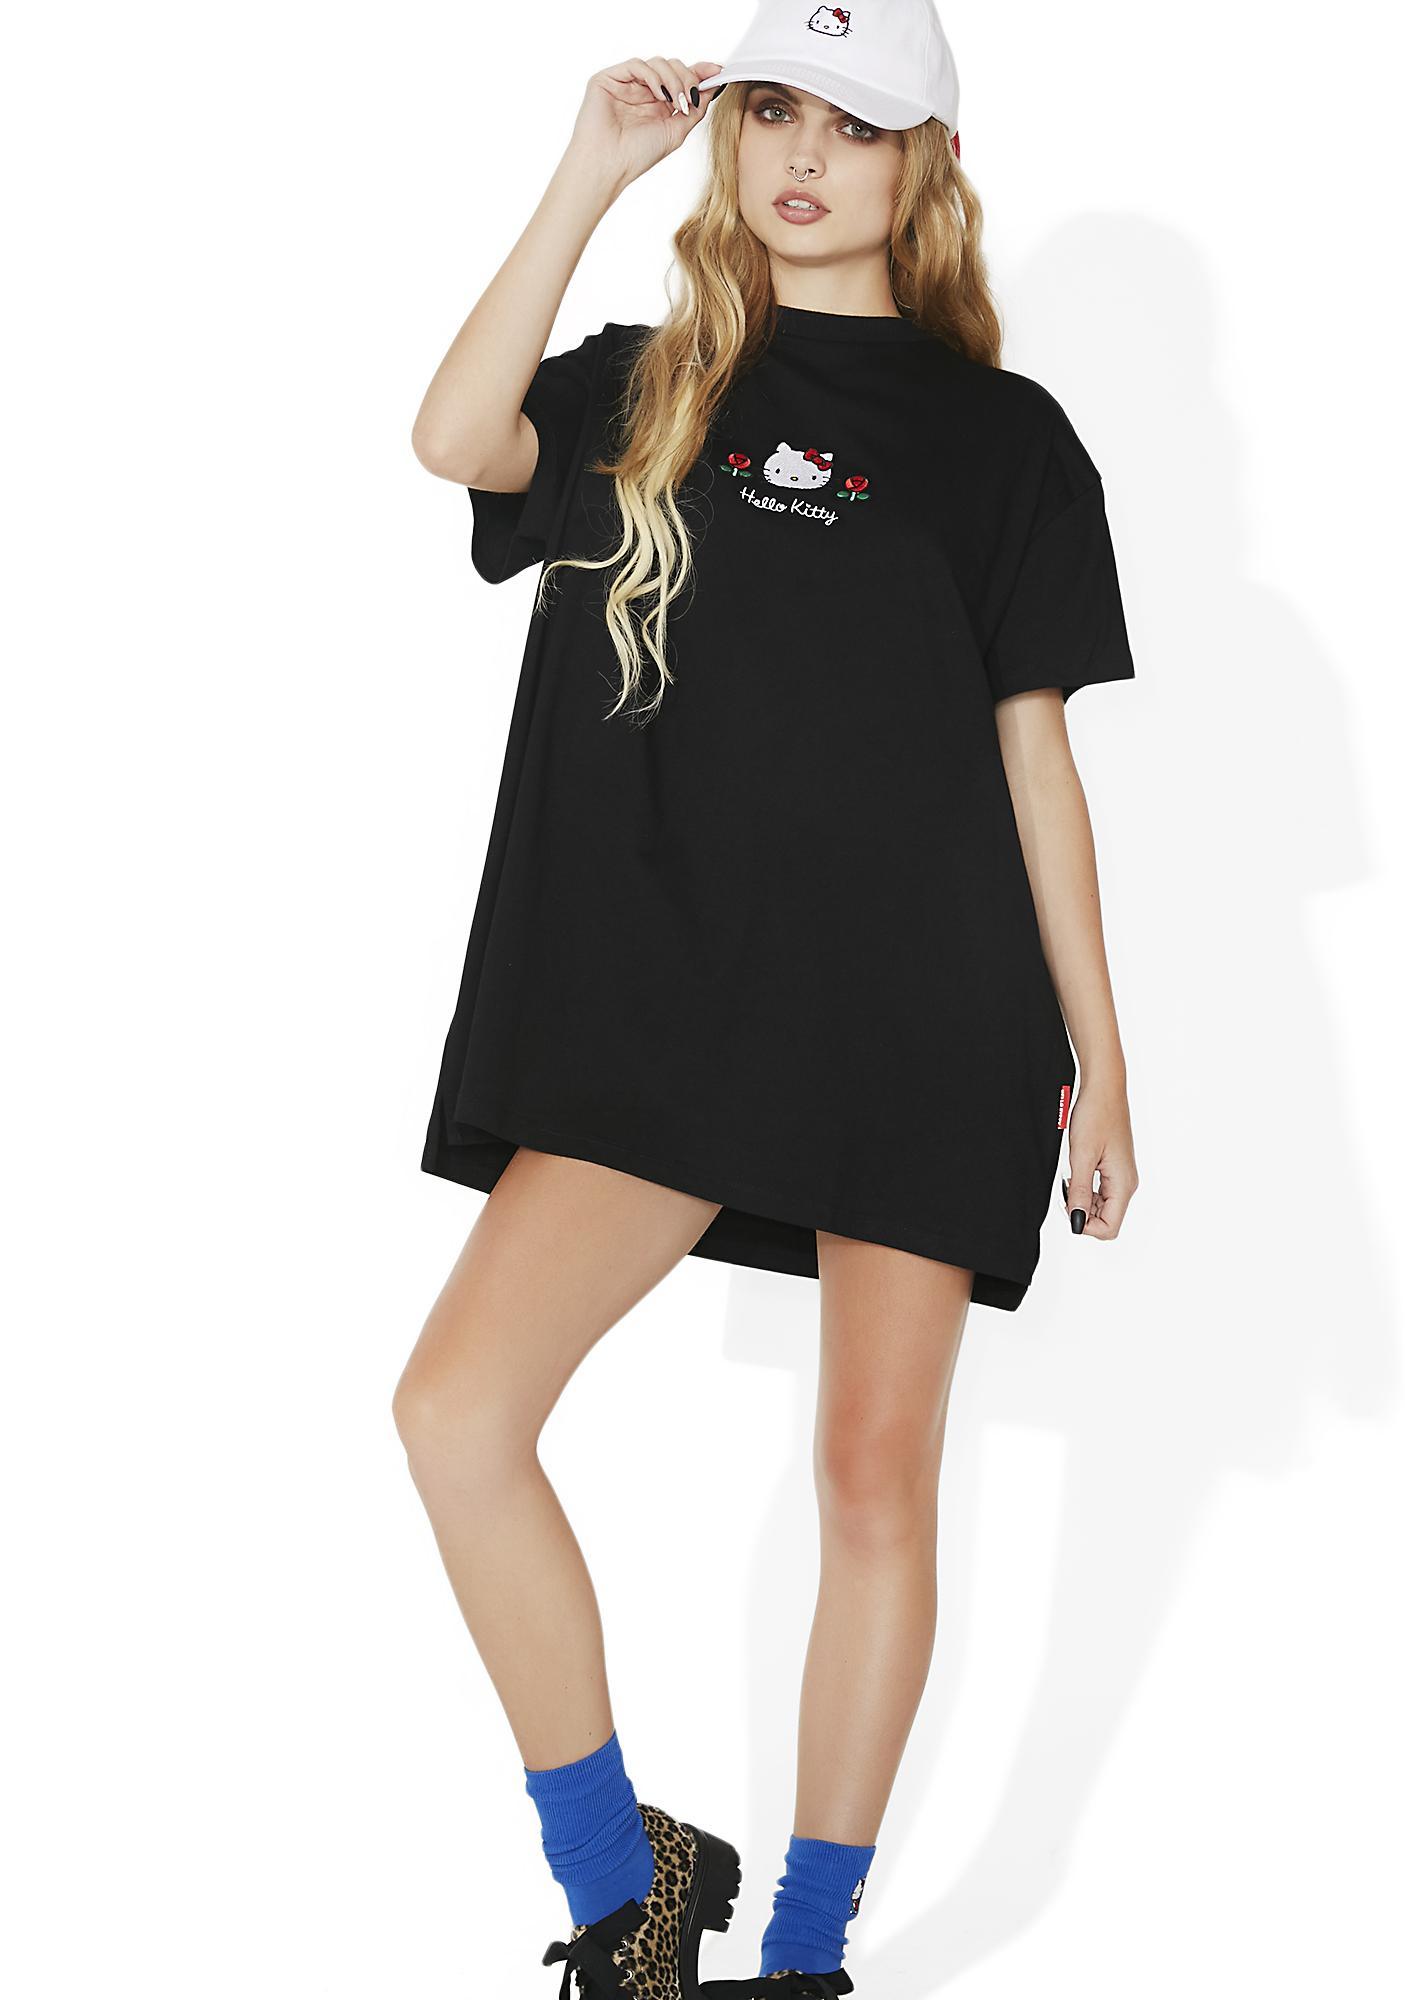 967e4c56582 ... Lazy Oaf Hello Kitty Oversized T-Shirt